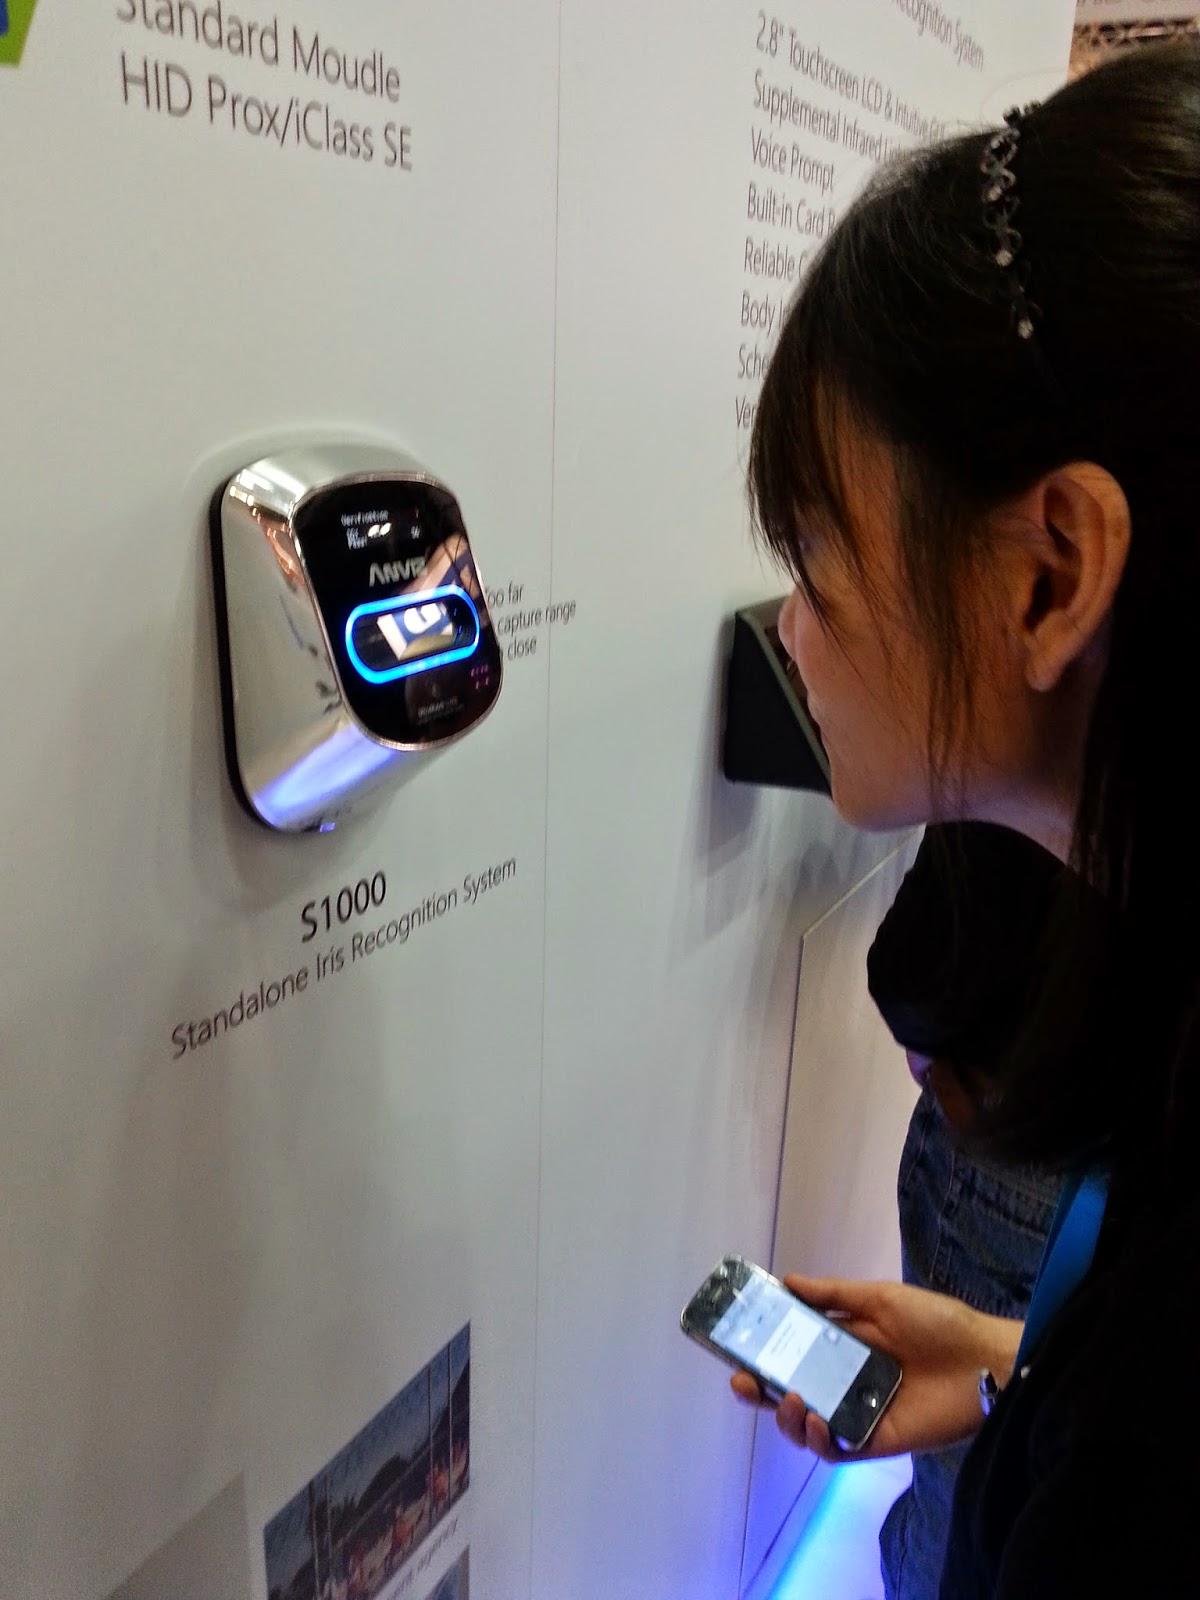 Reconocimiento biometrico por iris